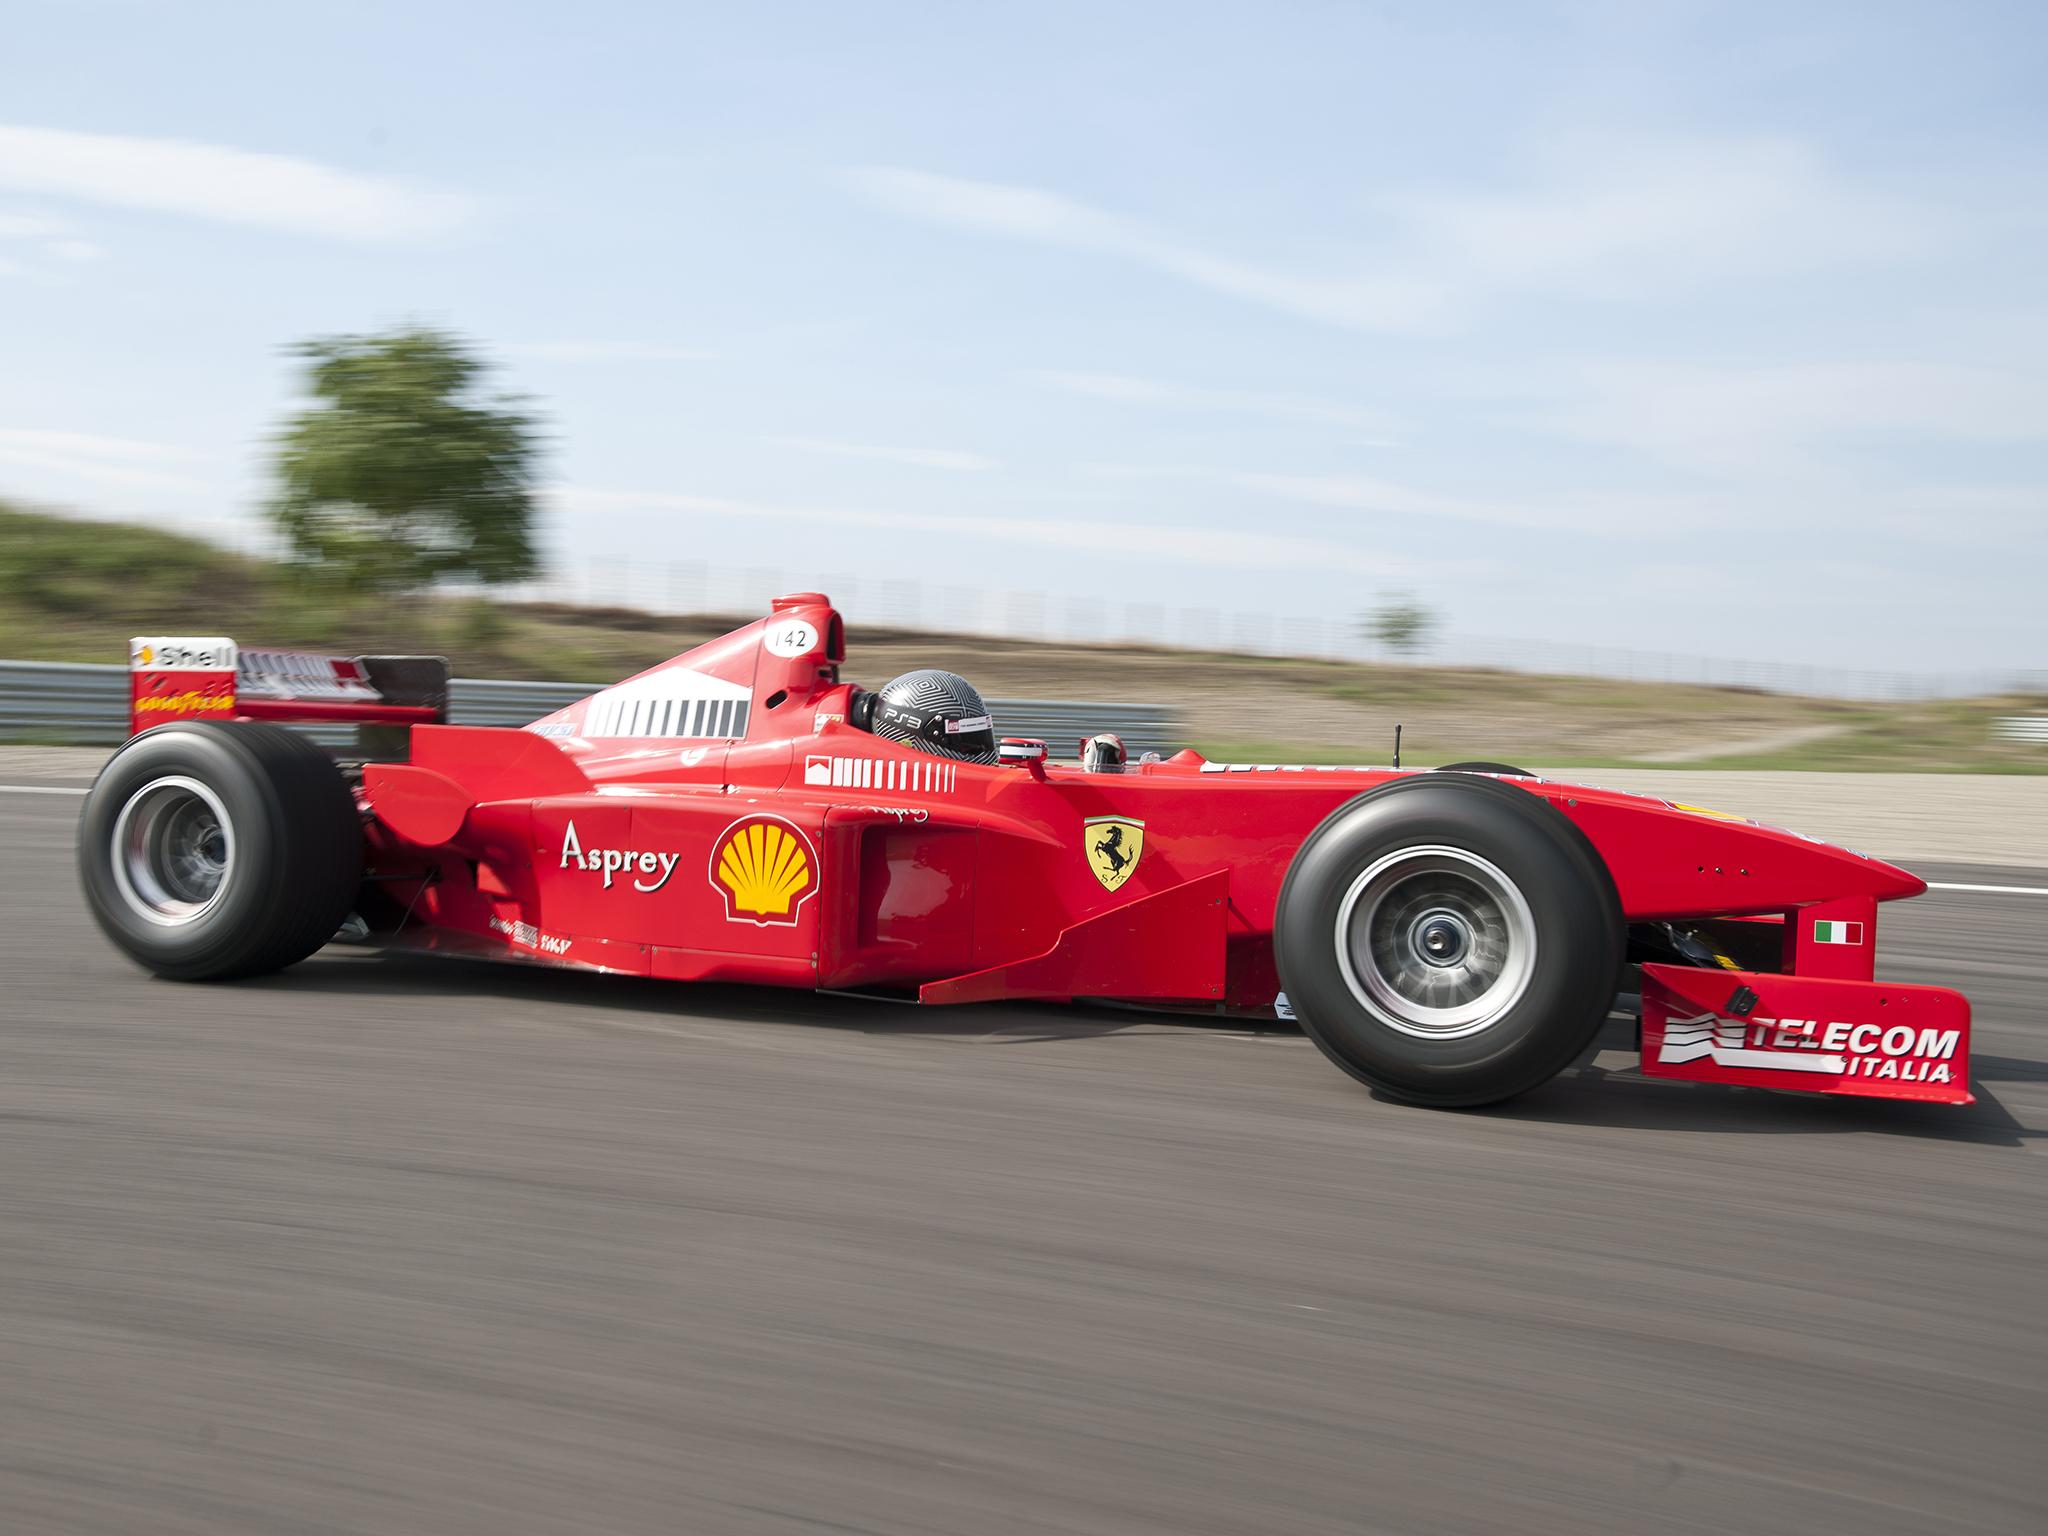 Ferrari F300 Formula 1 - 2048x1536